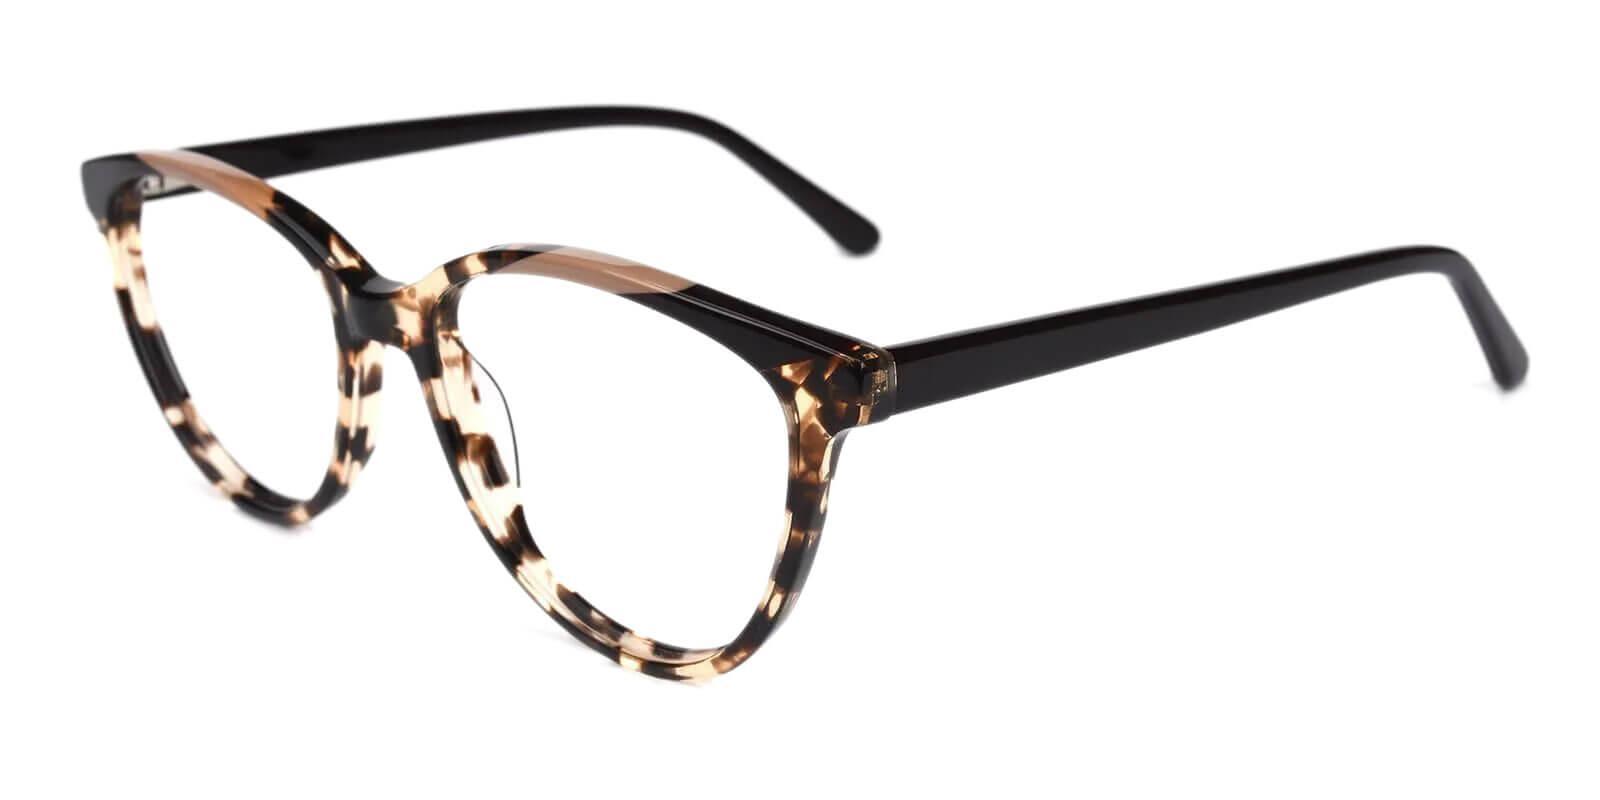 Joanne Leopard Acetate Eyeglasses , SpringHinges , UniversalBridgeFit Frames from ABBE Glasses